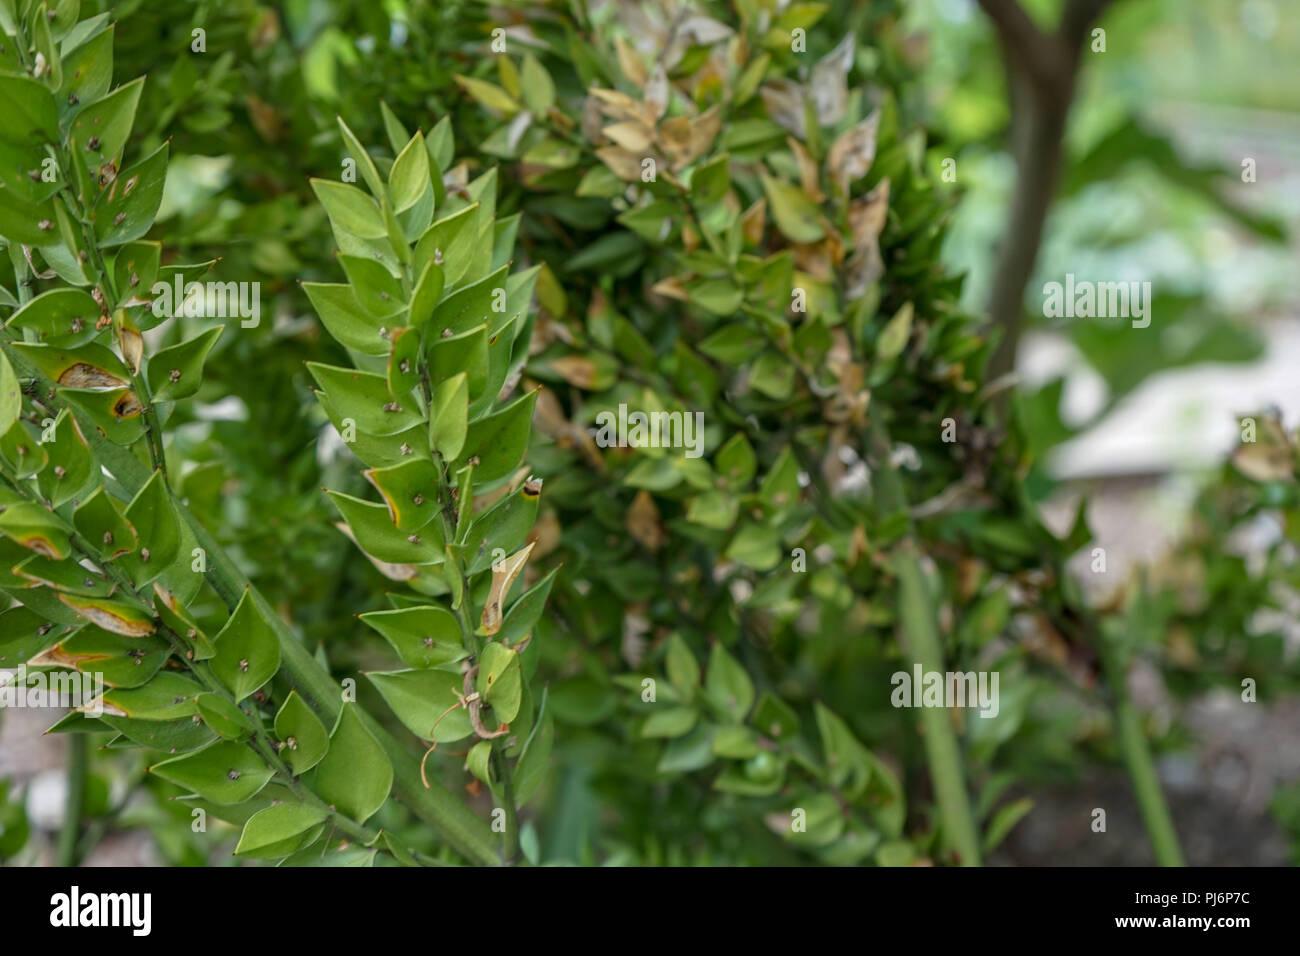 Immergrüne Pflanze, Ruscus aculeatus auch Metzger Besen namens Stockbild